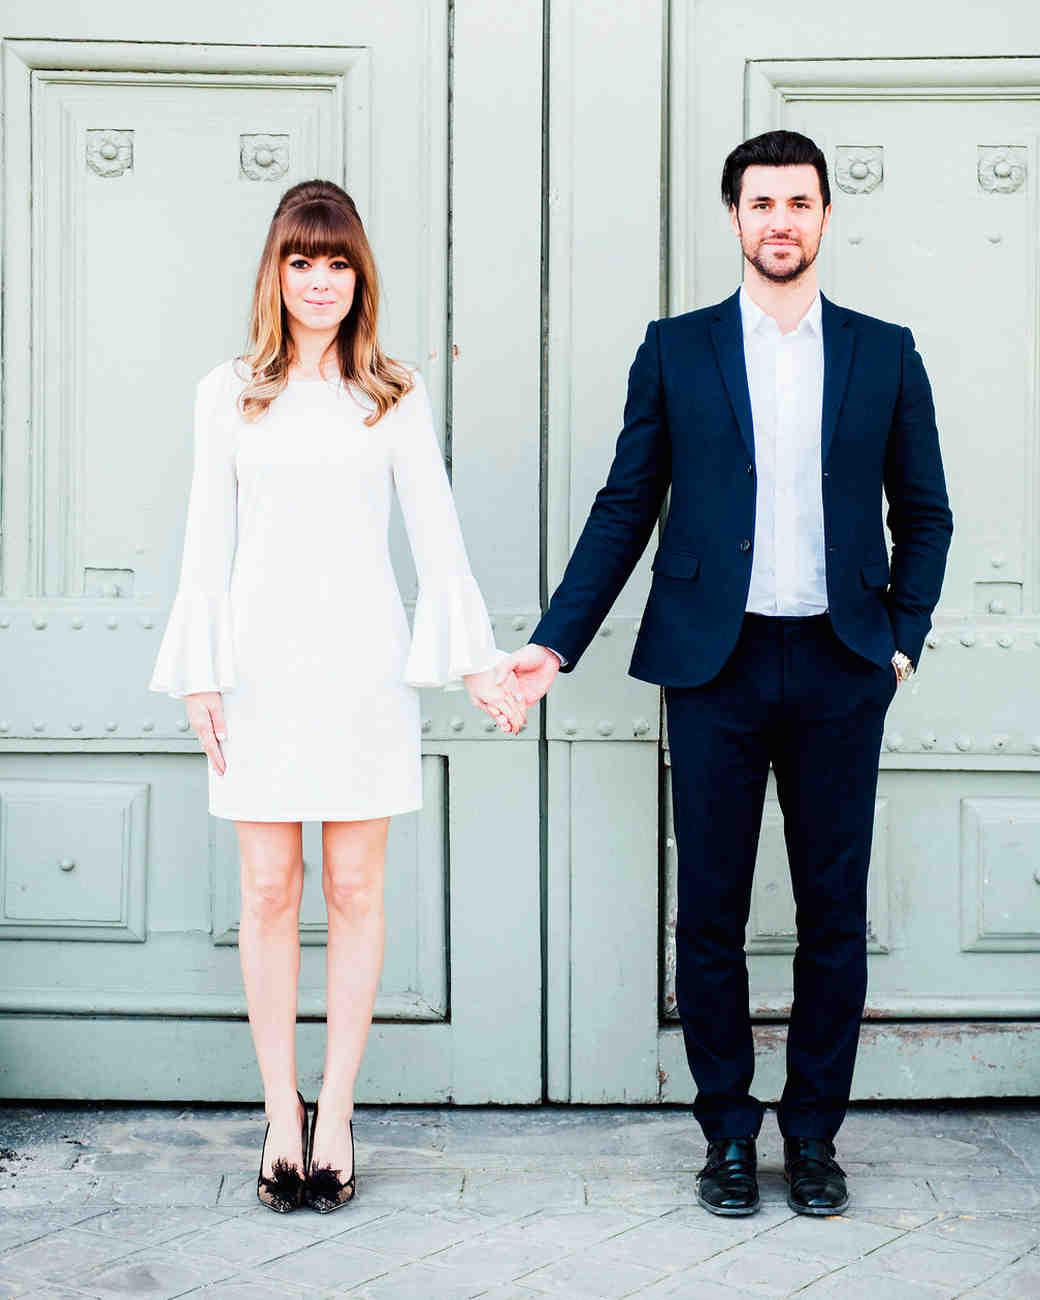 margo-and-me-martha-inspiration-jenny-bernheim-engagement-picture-0515.jpg